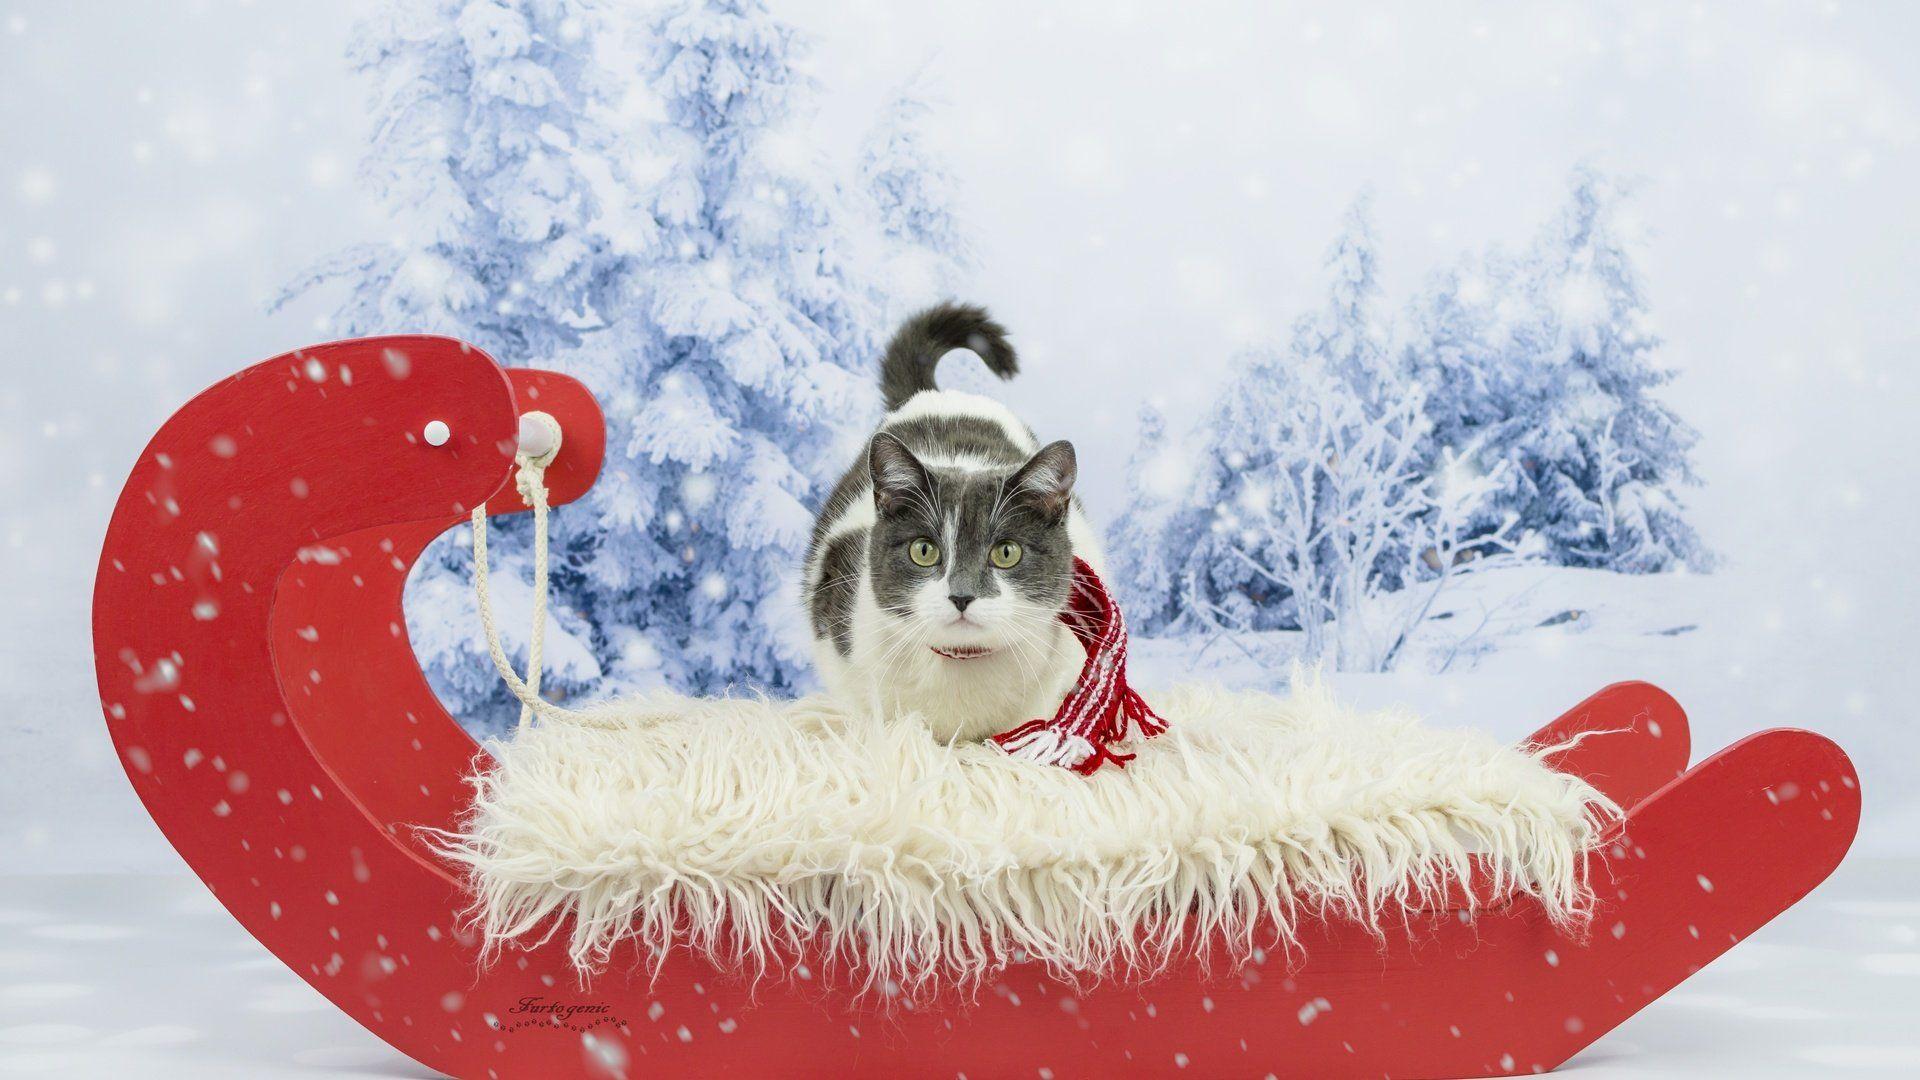 Christmas Sleigh 1920x1080 wallpaper